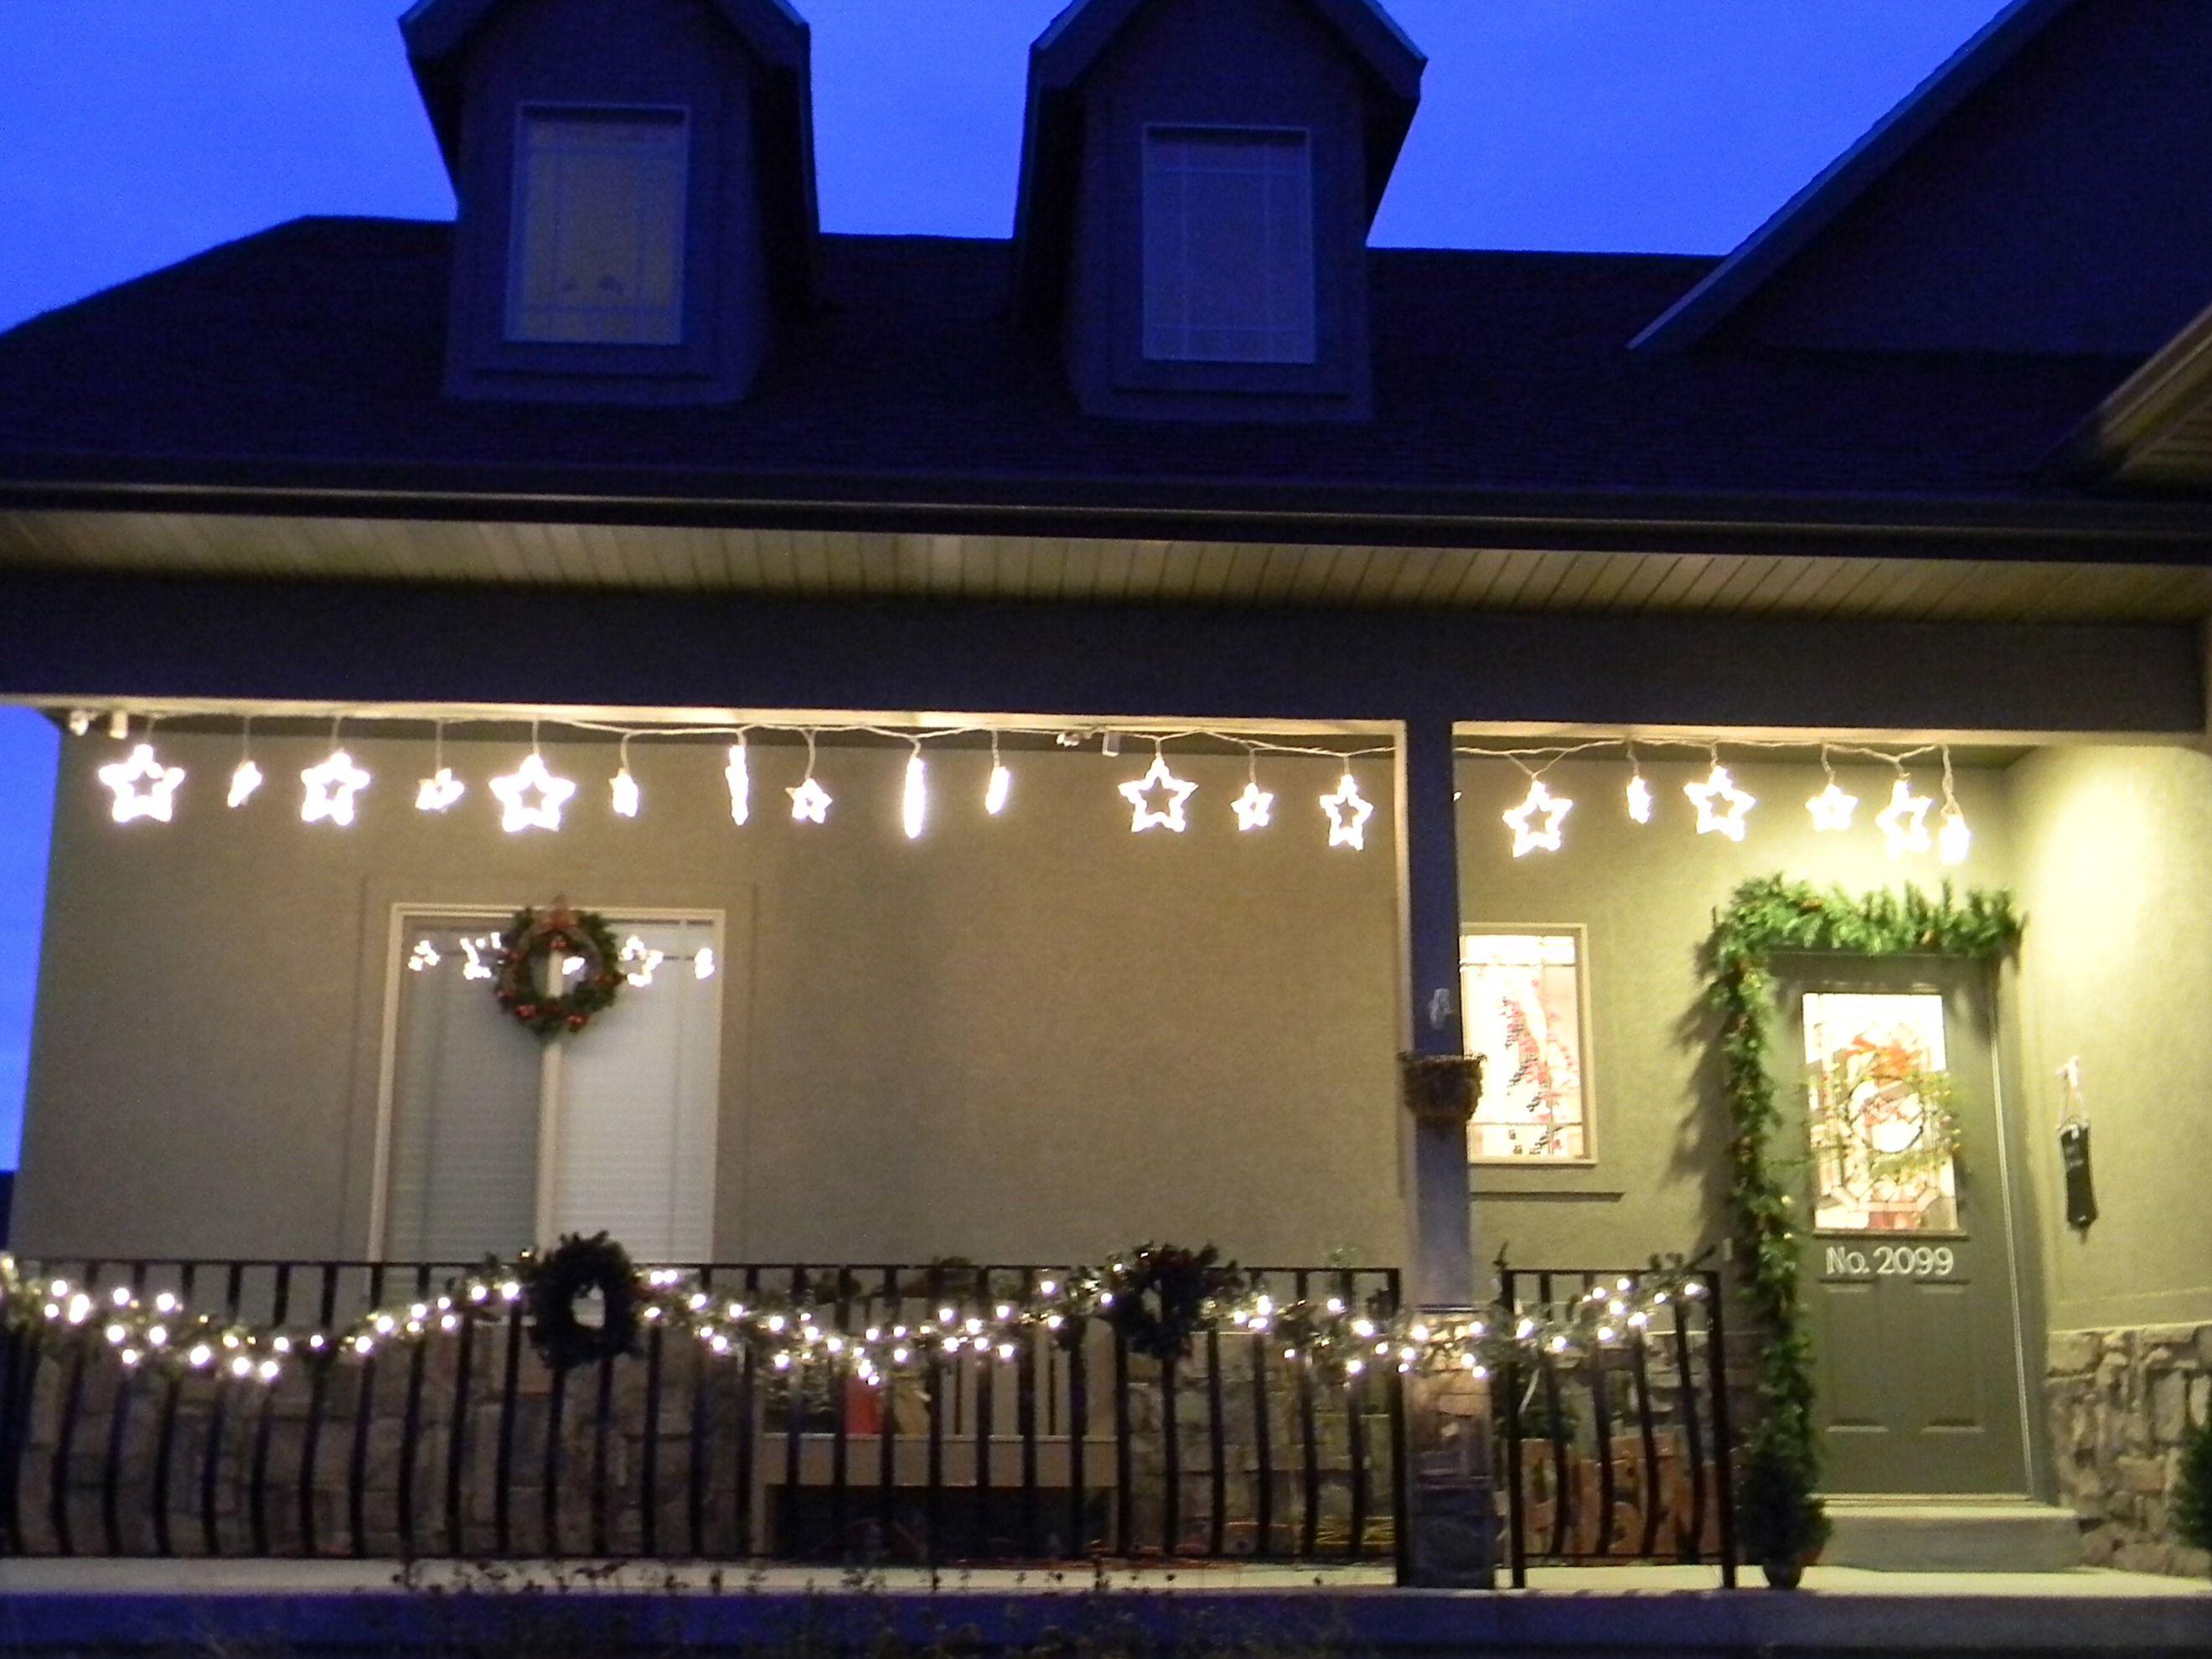 Sparkling Christmas Garland Lights Decoration Ideas